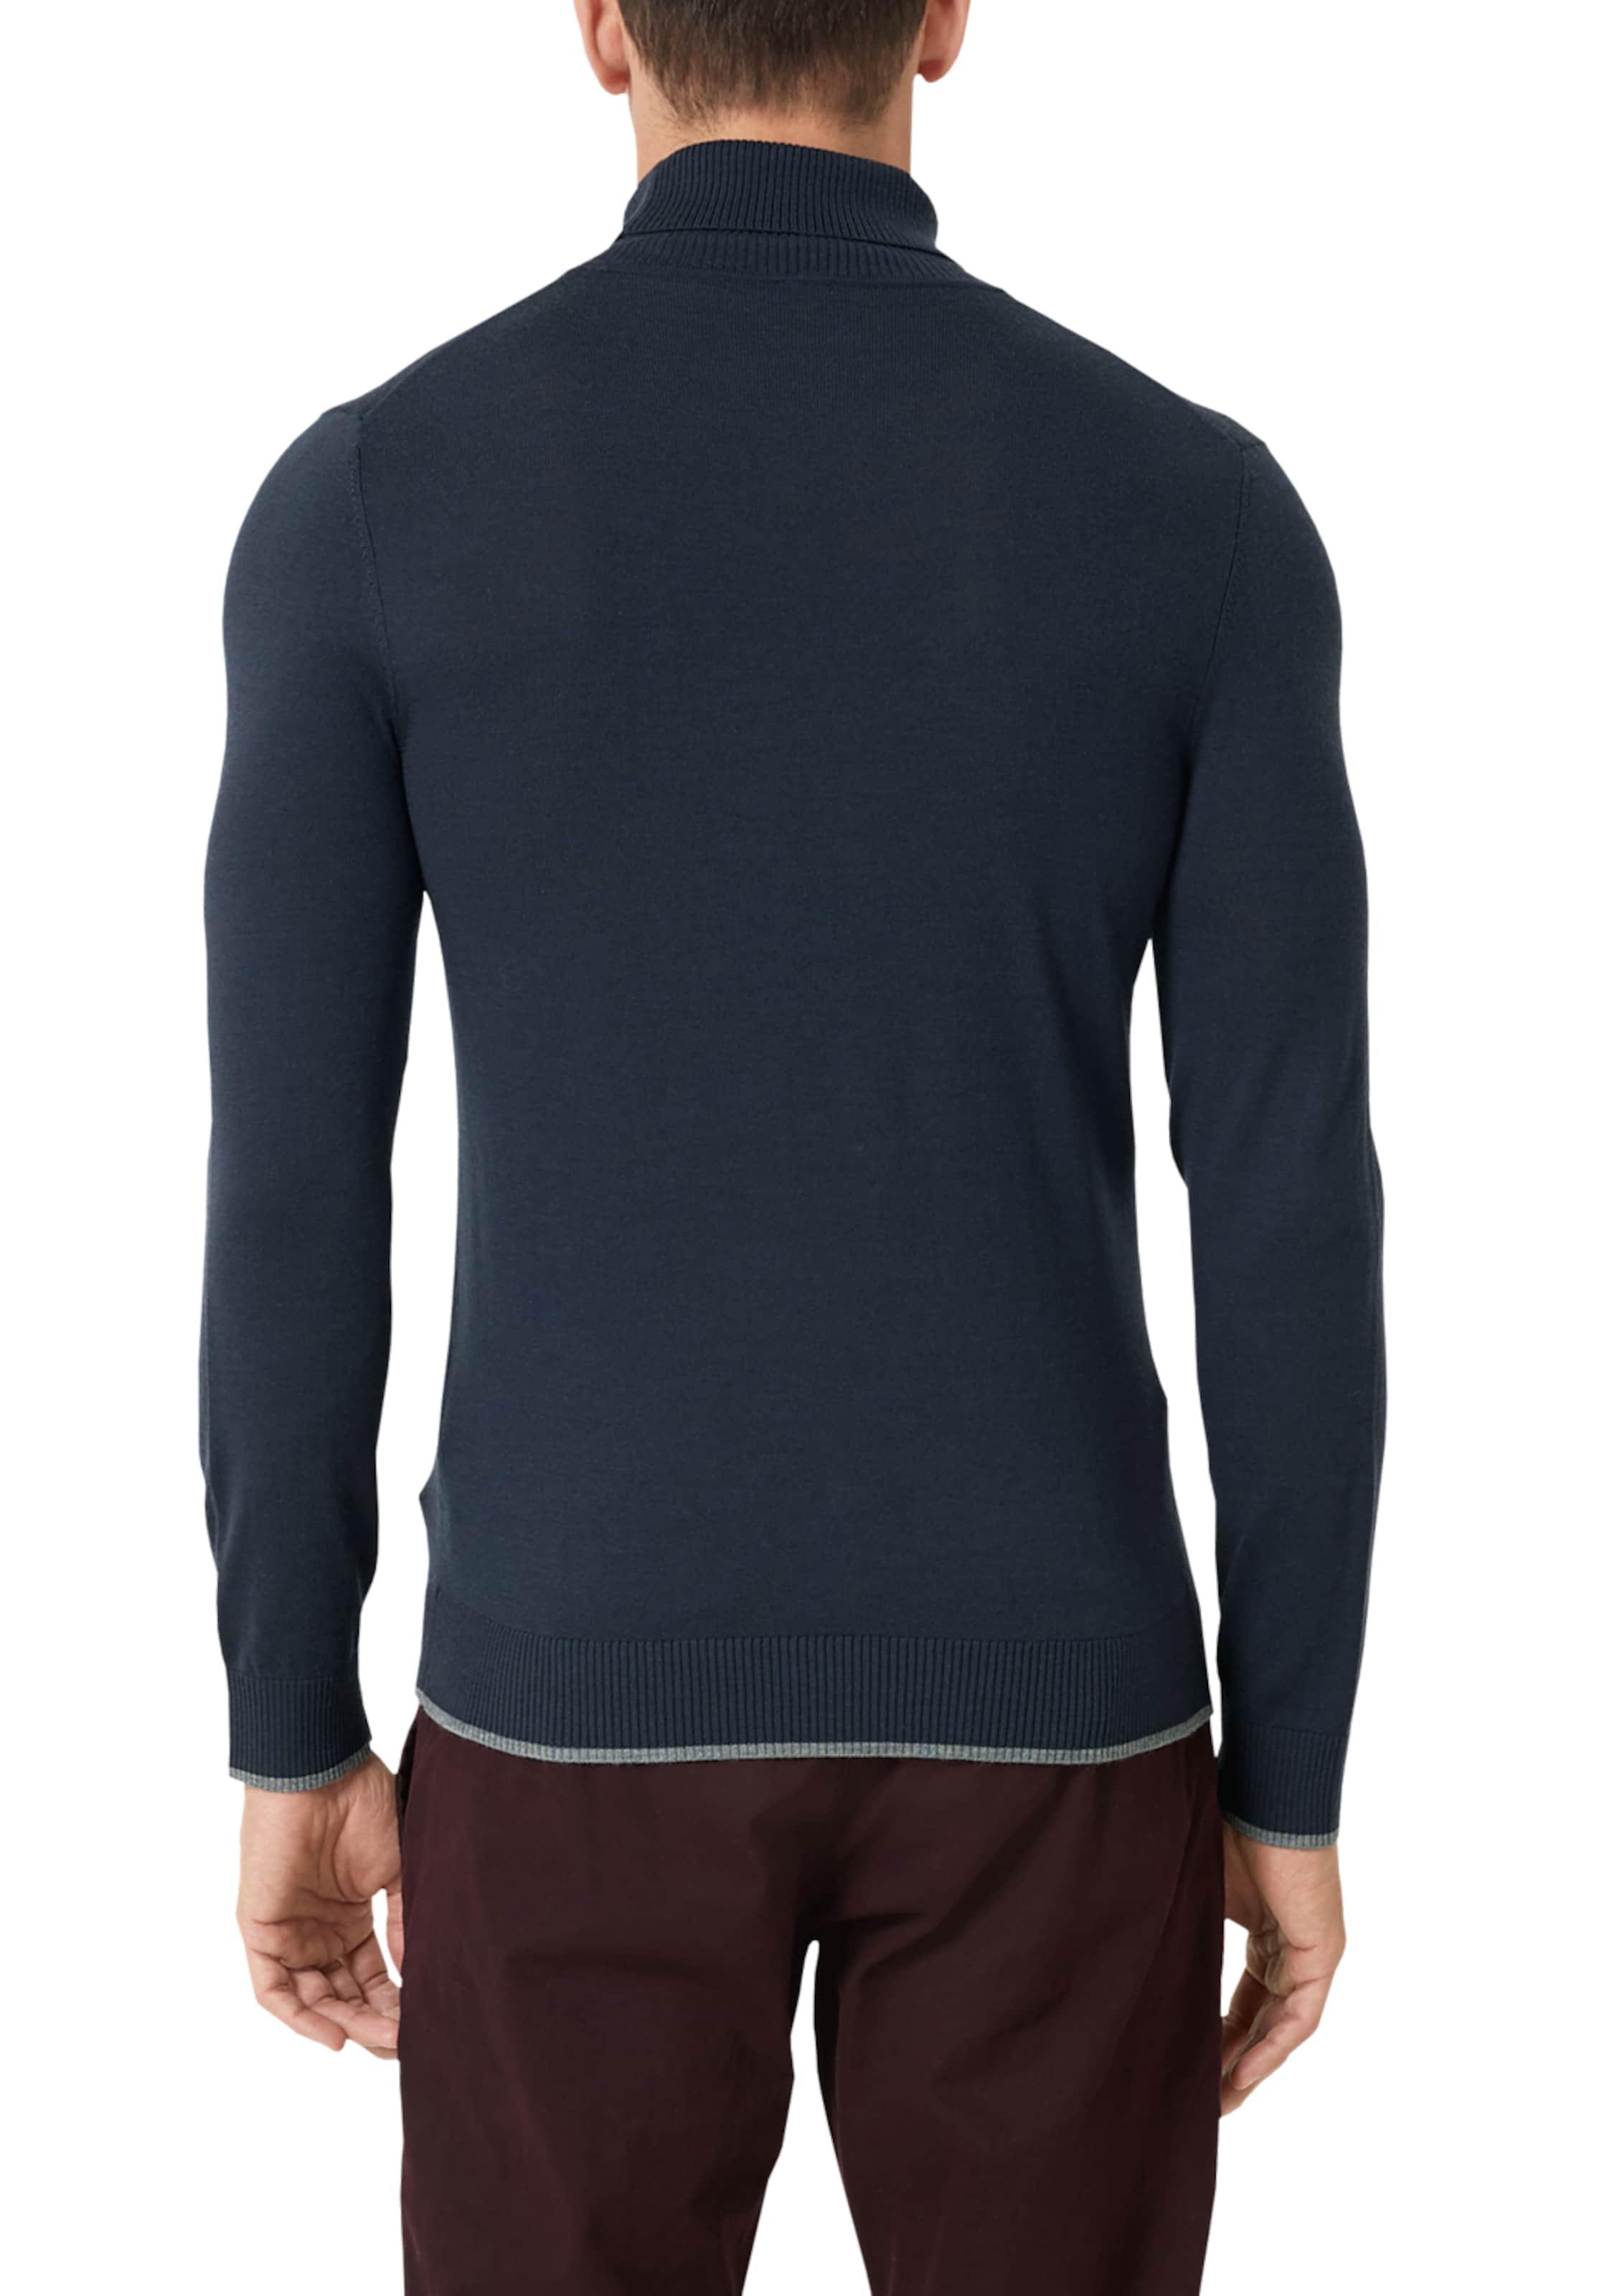 Label S Red Pullover oliver In NavyTaubenblau I9WYbeEHD2